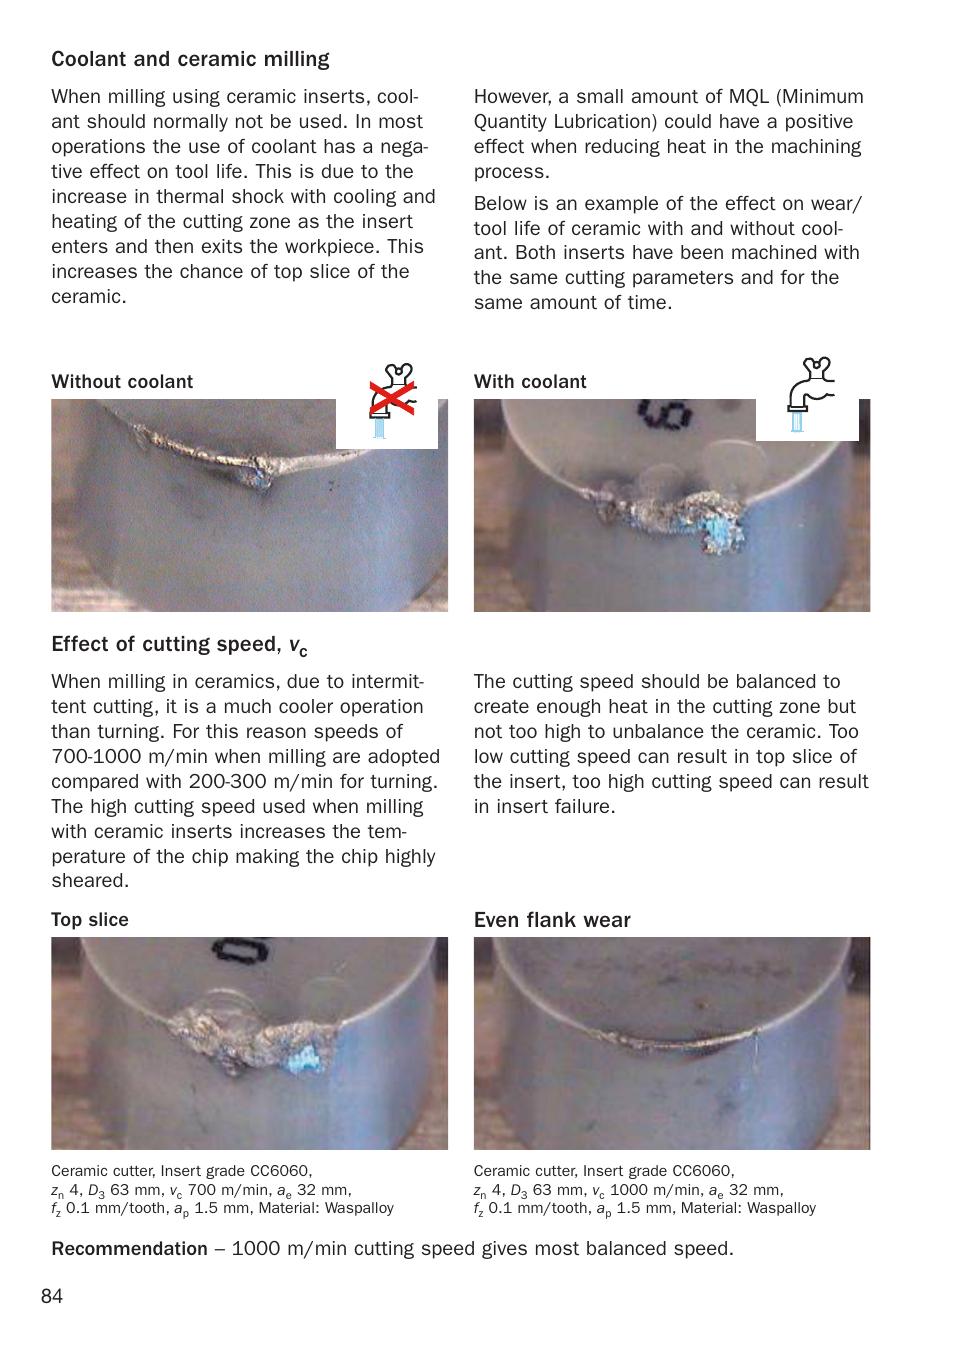 Even flank wear | Sandvik Coromant Heat resistant super alloys User Manual  | Page 86 /